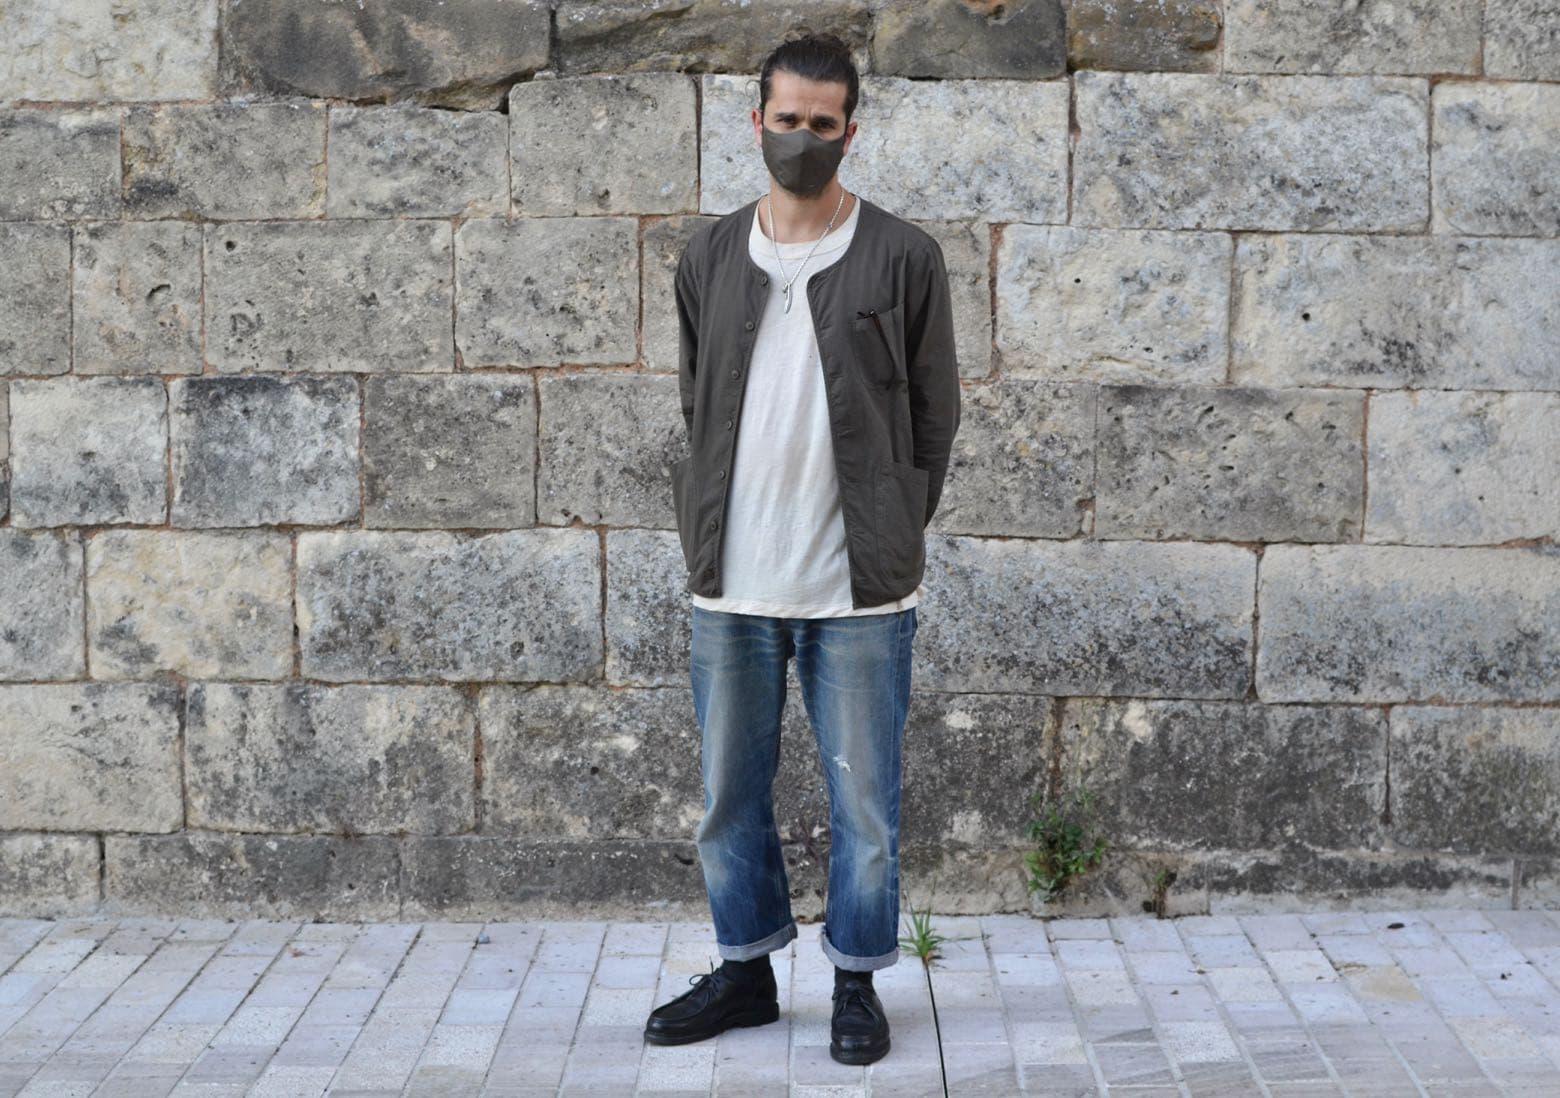 look style stret heritage workwear homme avec jean coupe droite et comment porter paraboot michael